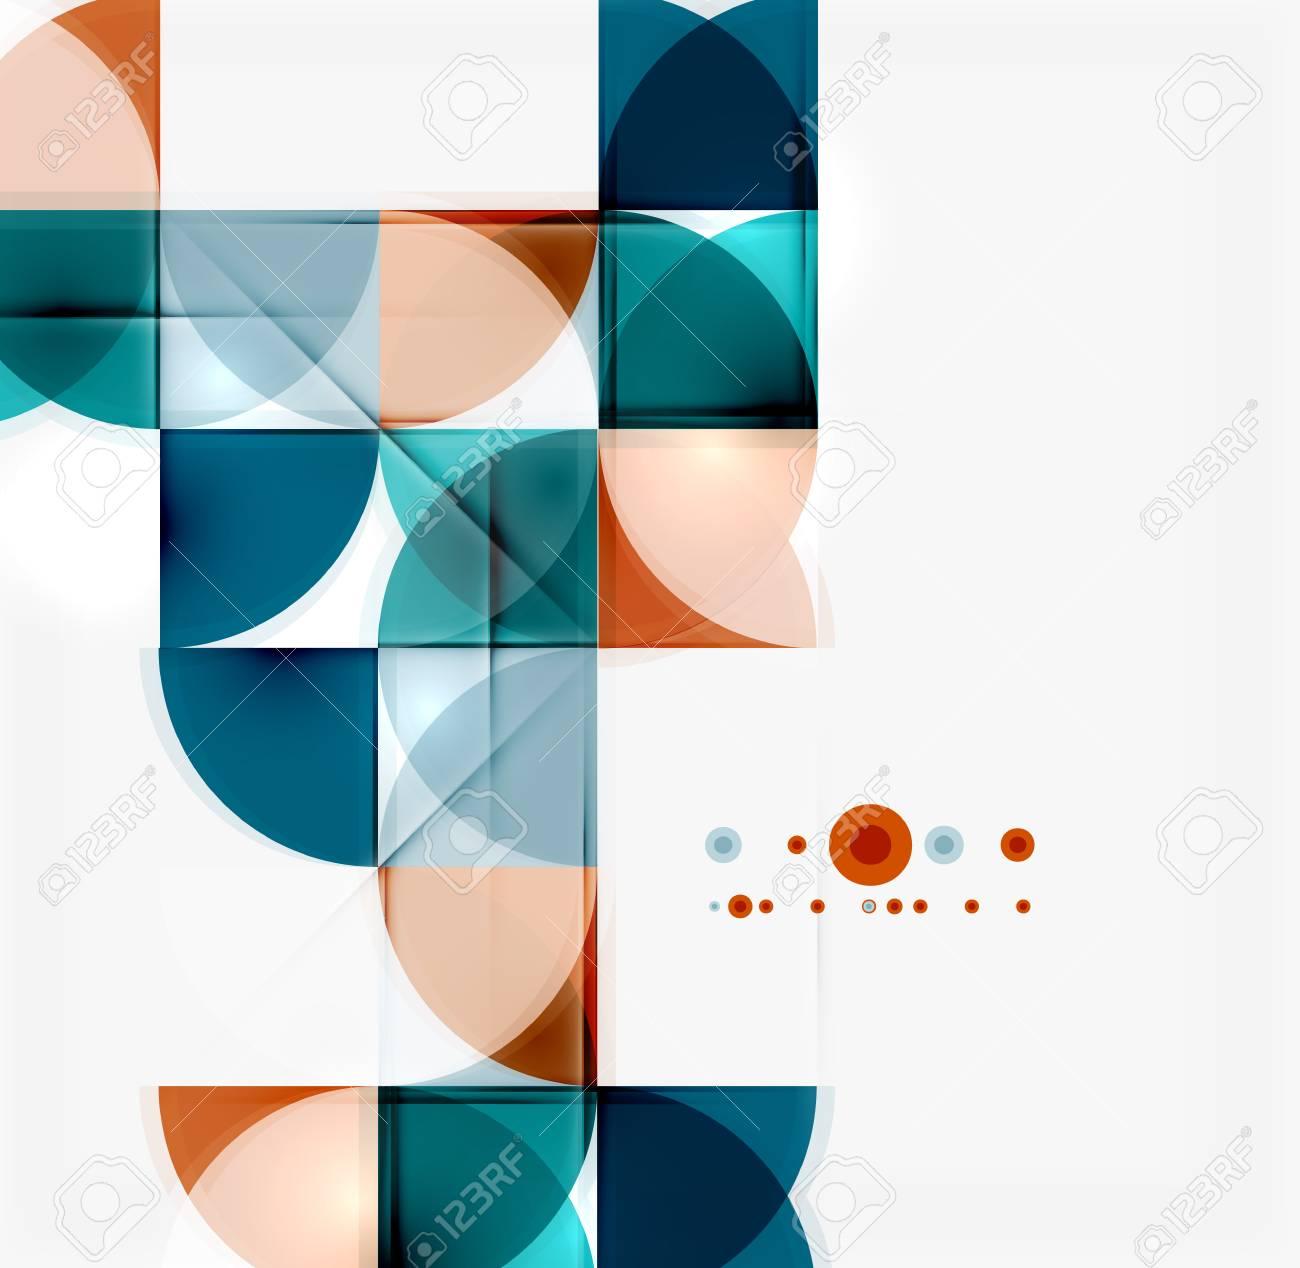 abstract mosaic background online presentation website element